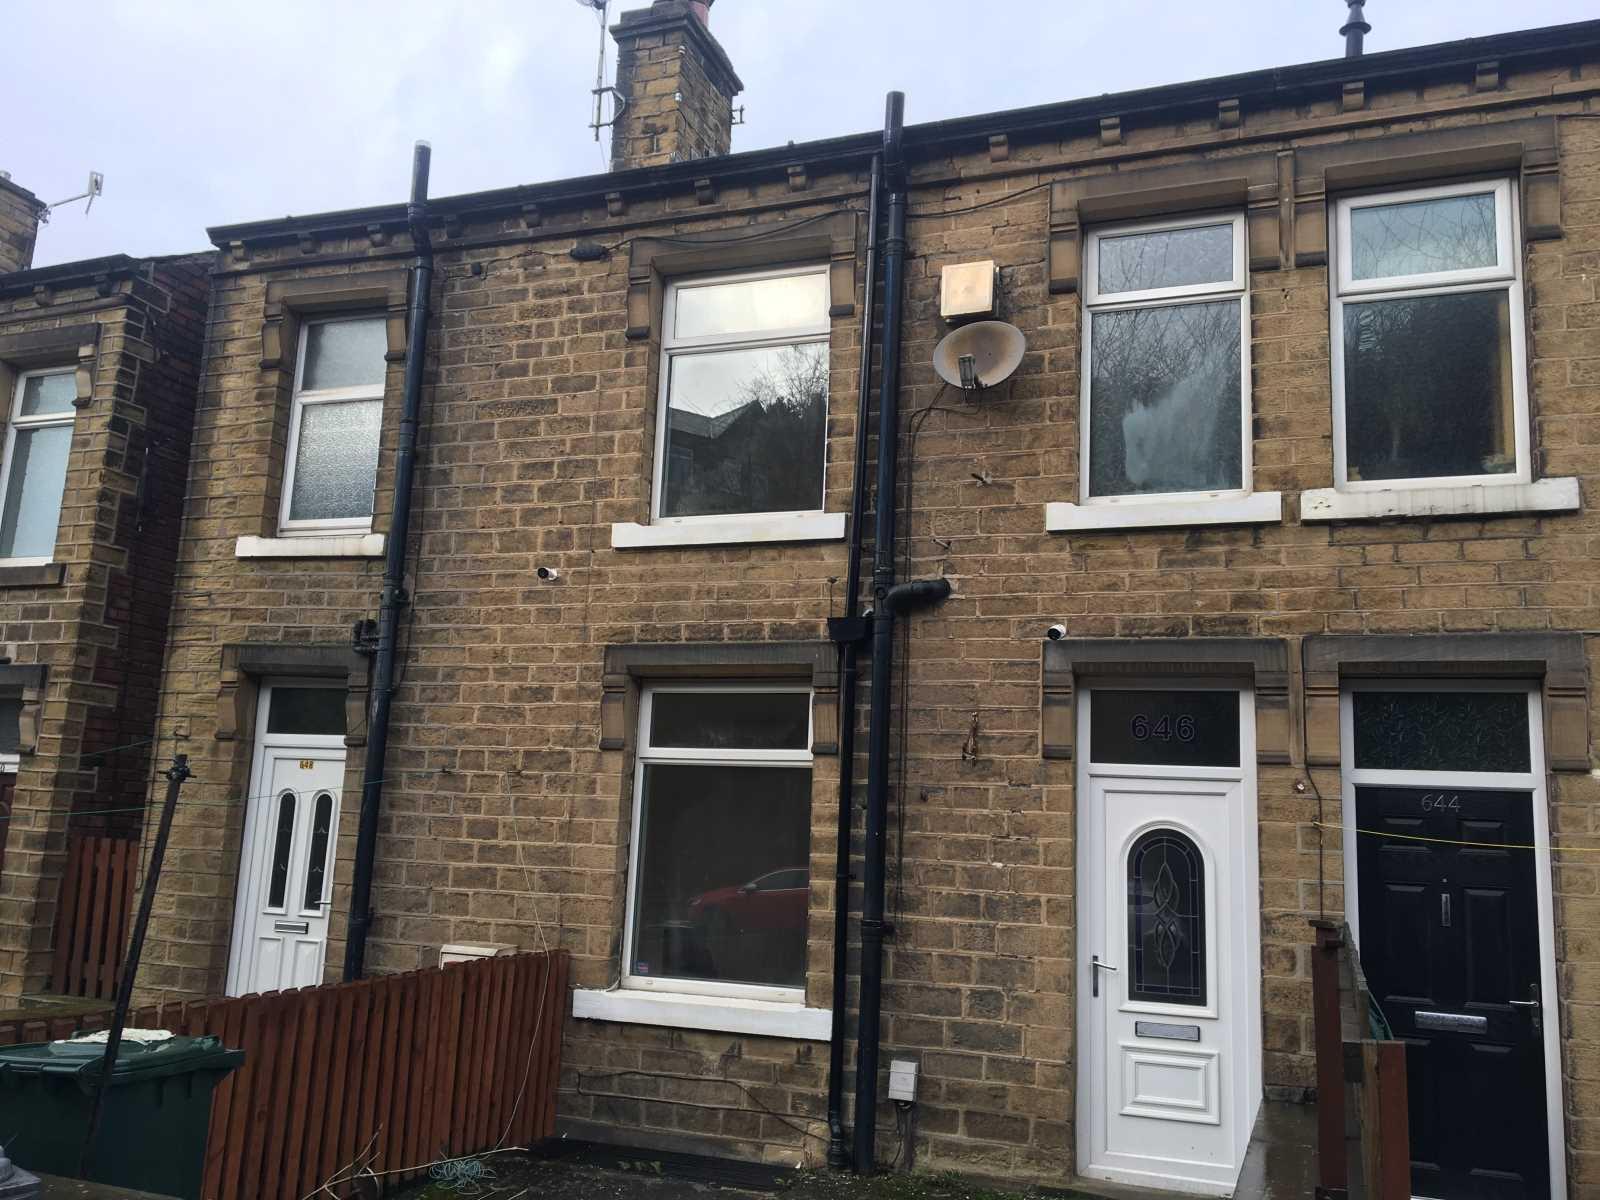 646 Manchester Road, Linthwaite, Huddersfield, HD7 5QY